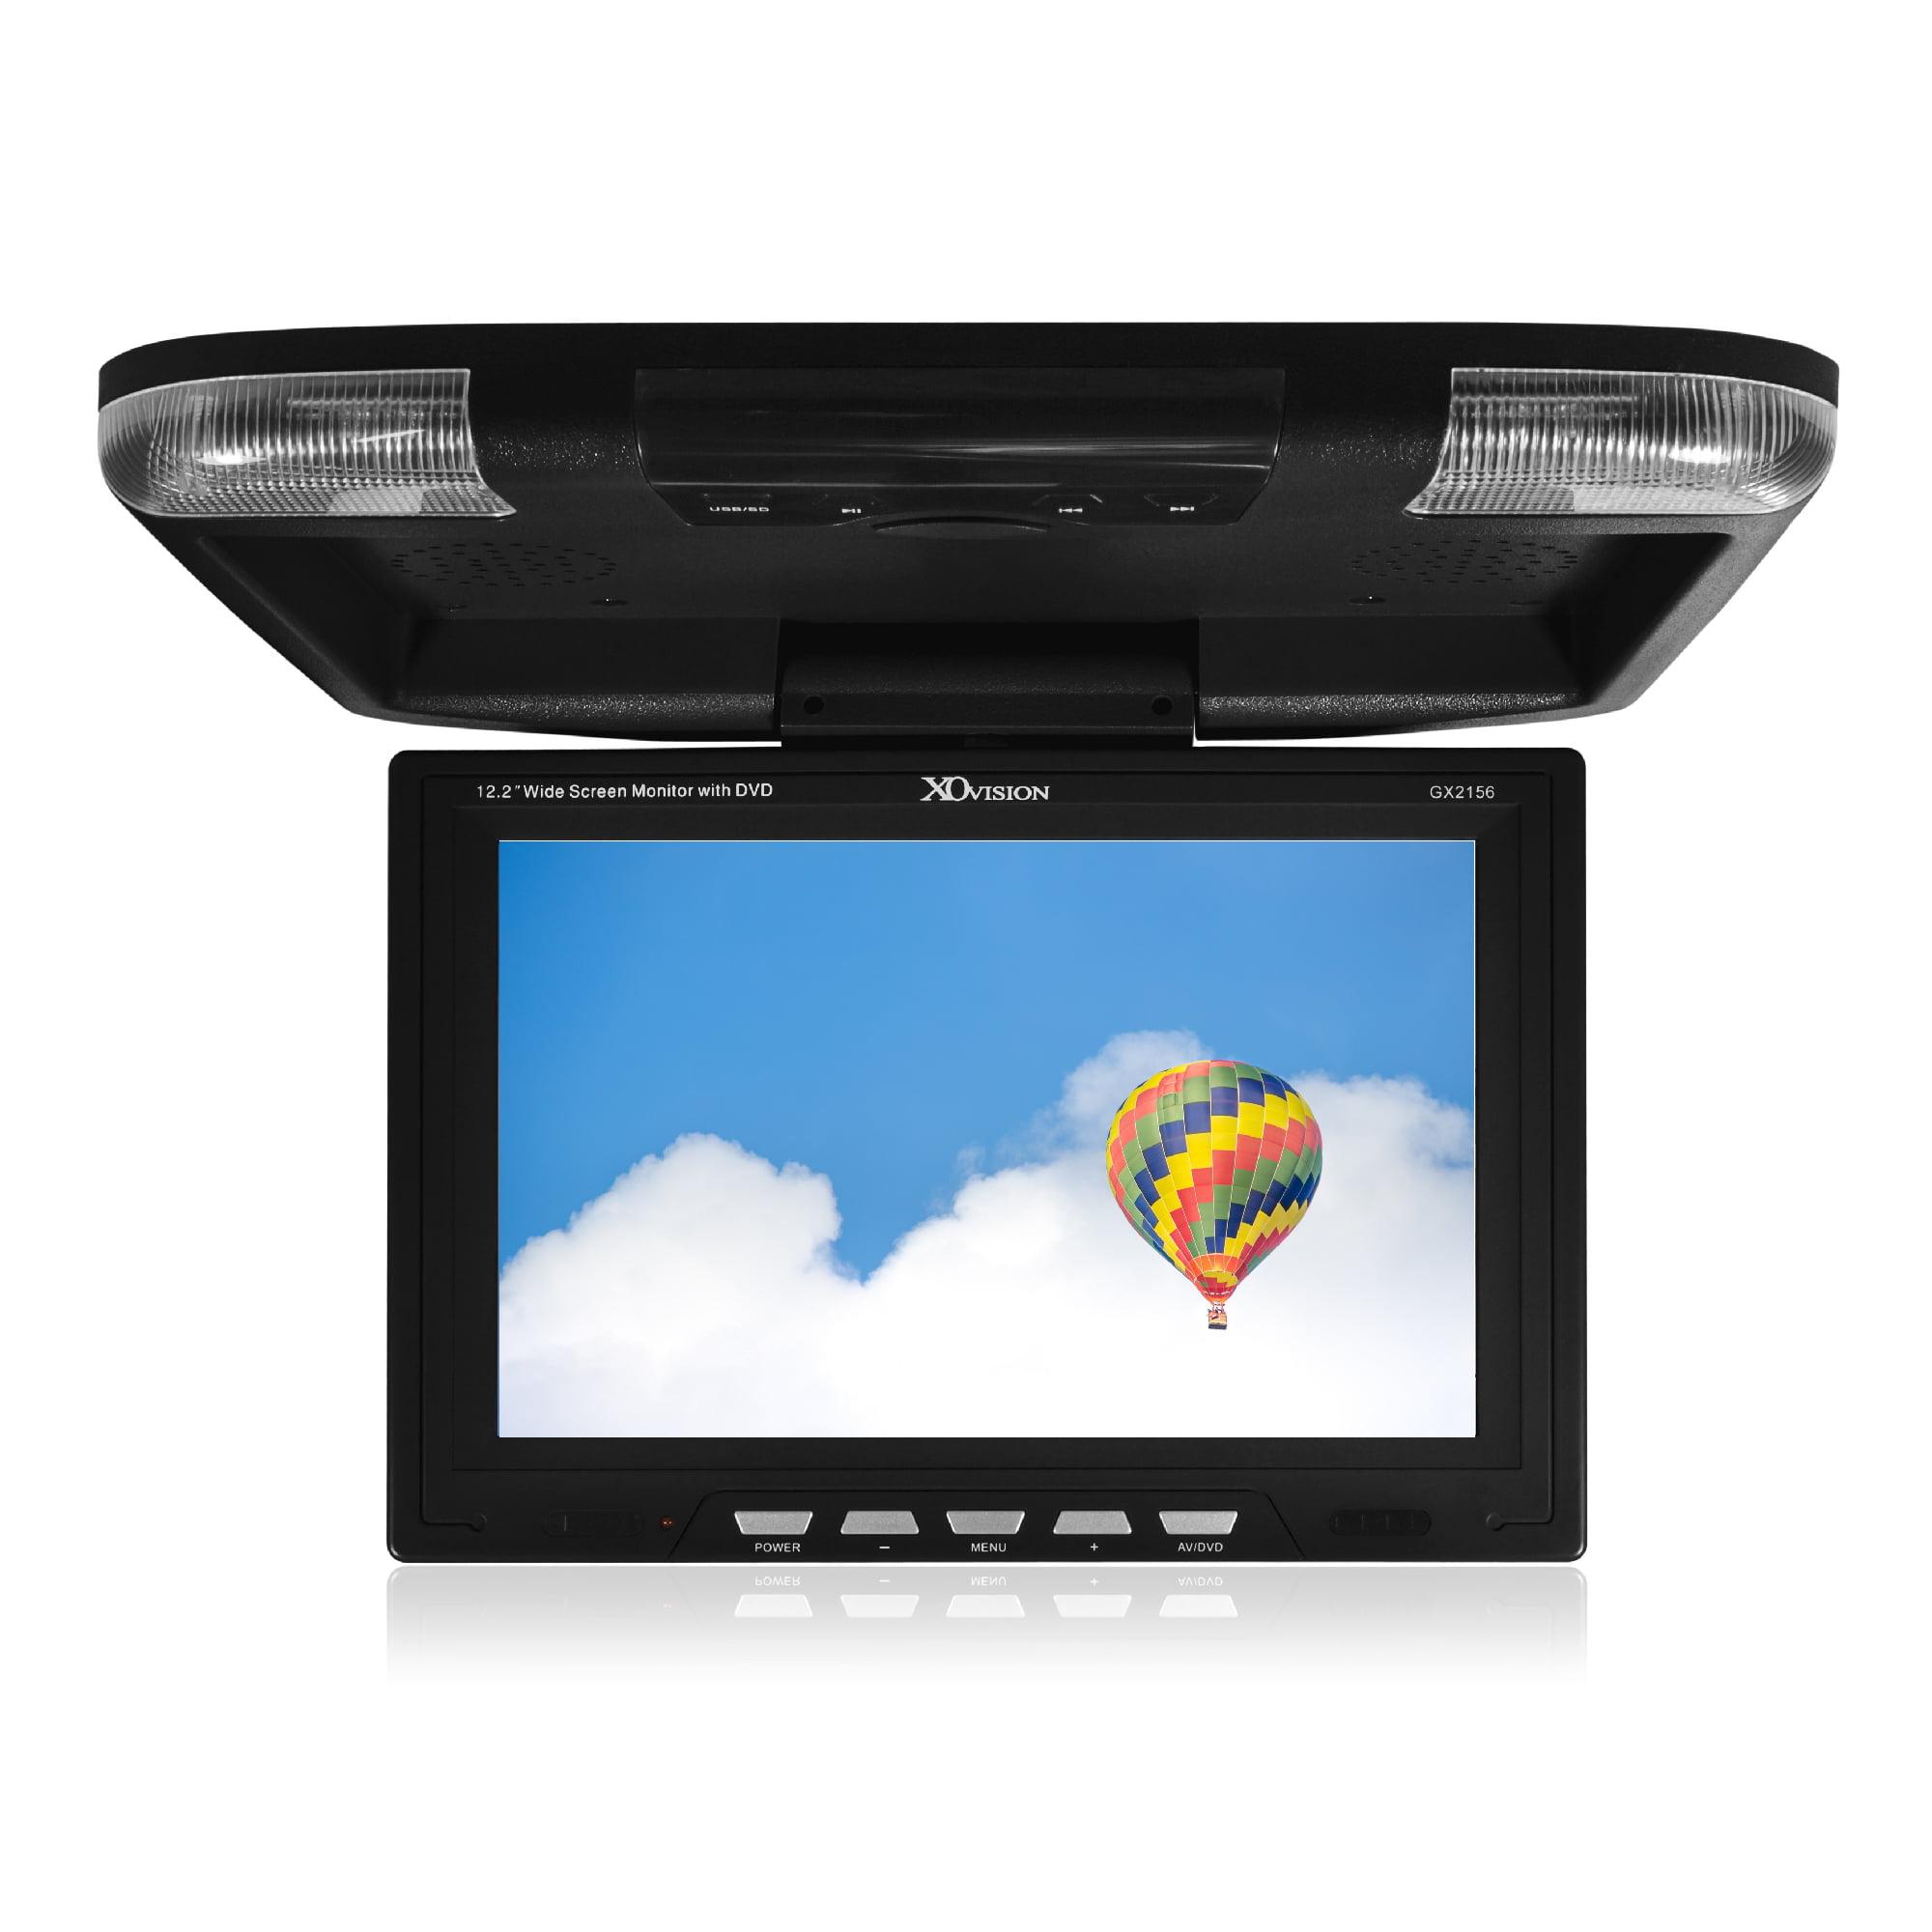 "Xo Vision Gx2156b 12.2"" Ceiling-mount Lcd Monitor With Ir Transmitter - Walmart."